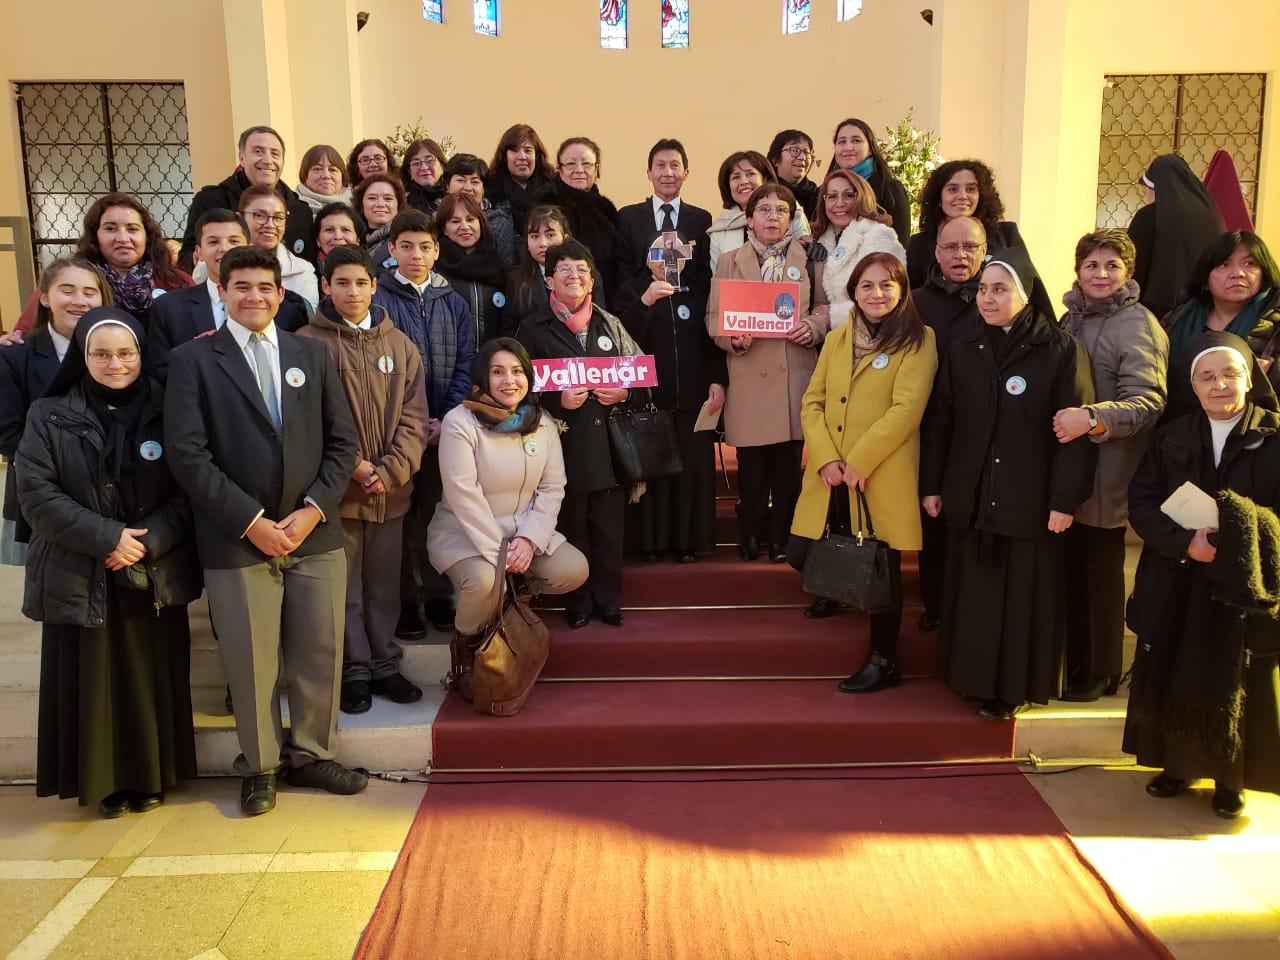 Congregación religiosa de Santa Marta celebra 70 años de presencia en Latinoamérica